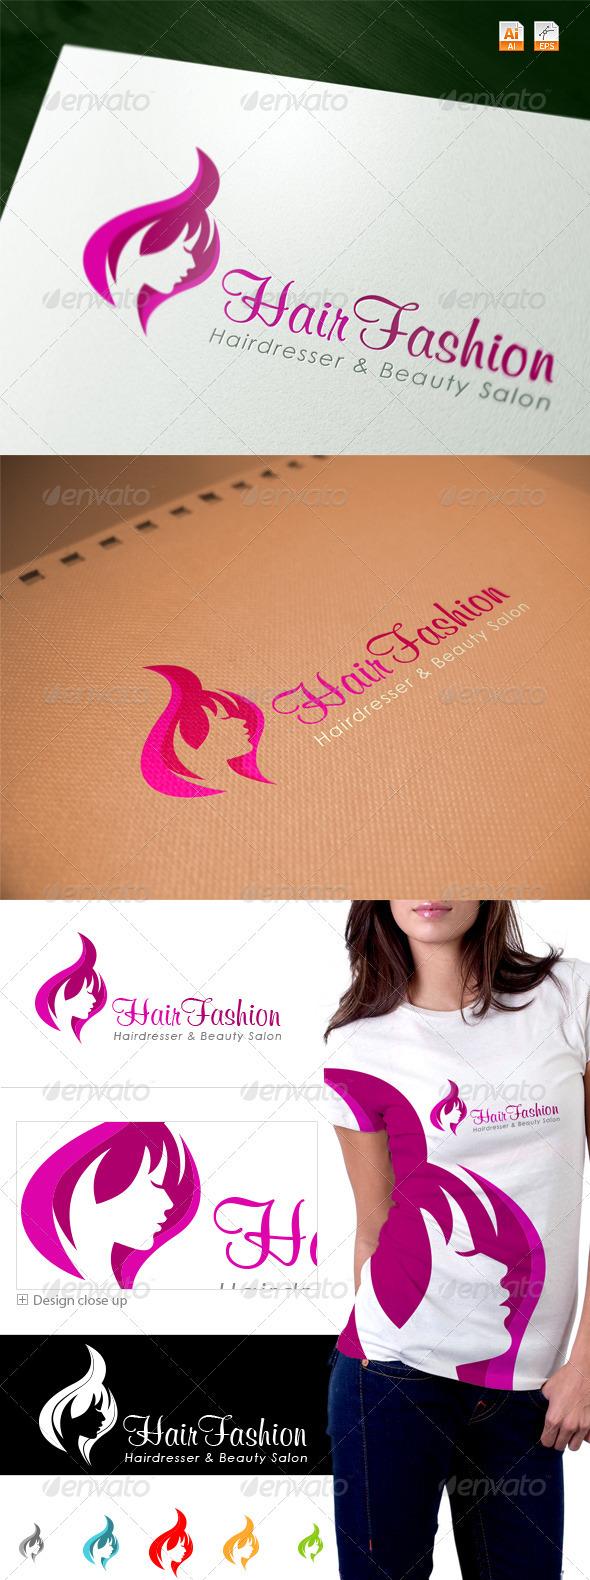 GraphicRiver Hair Fashion Spa & Salon Logo 3657194